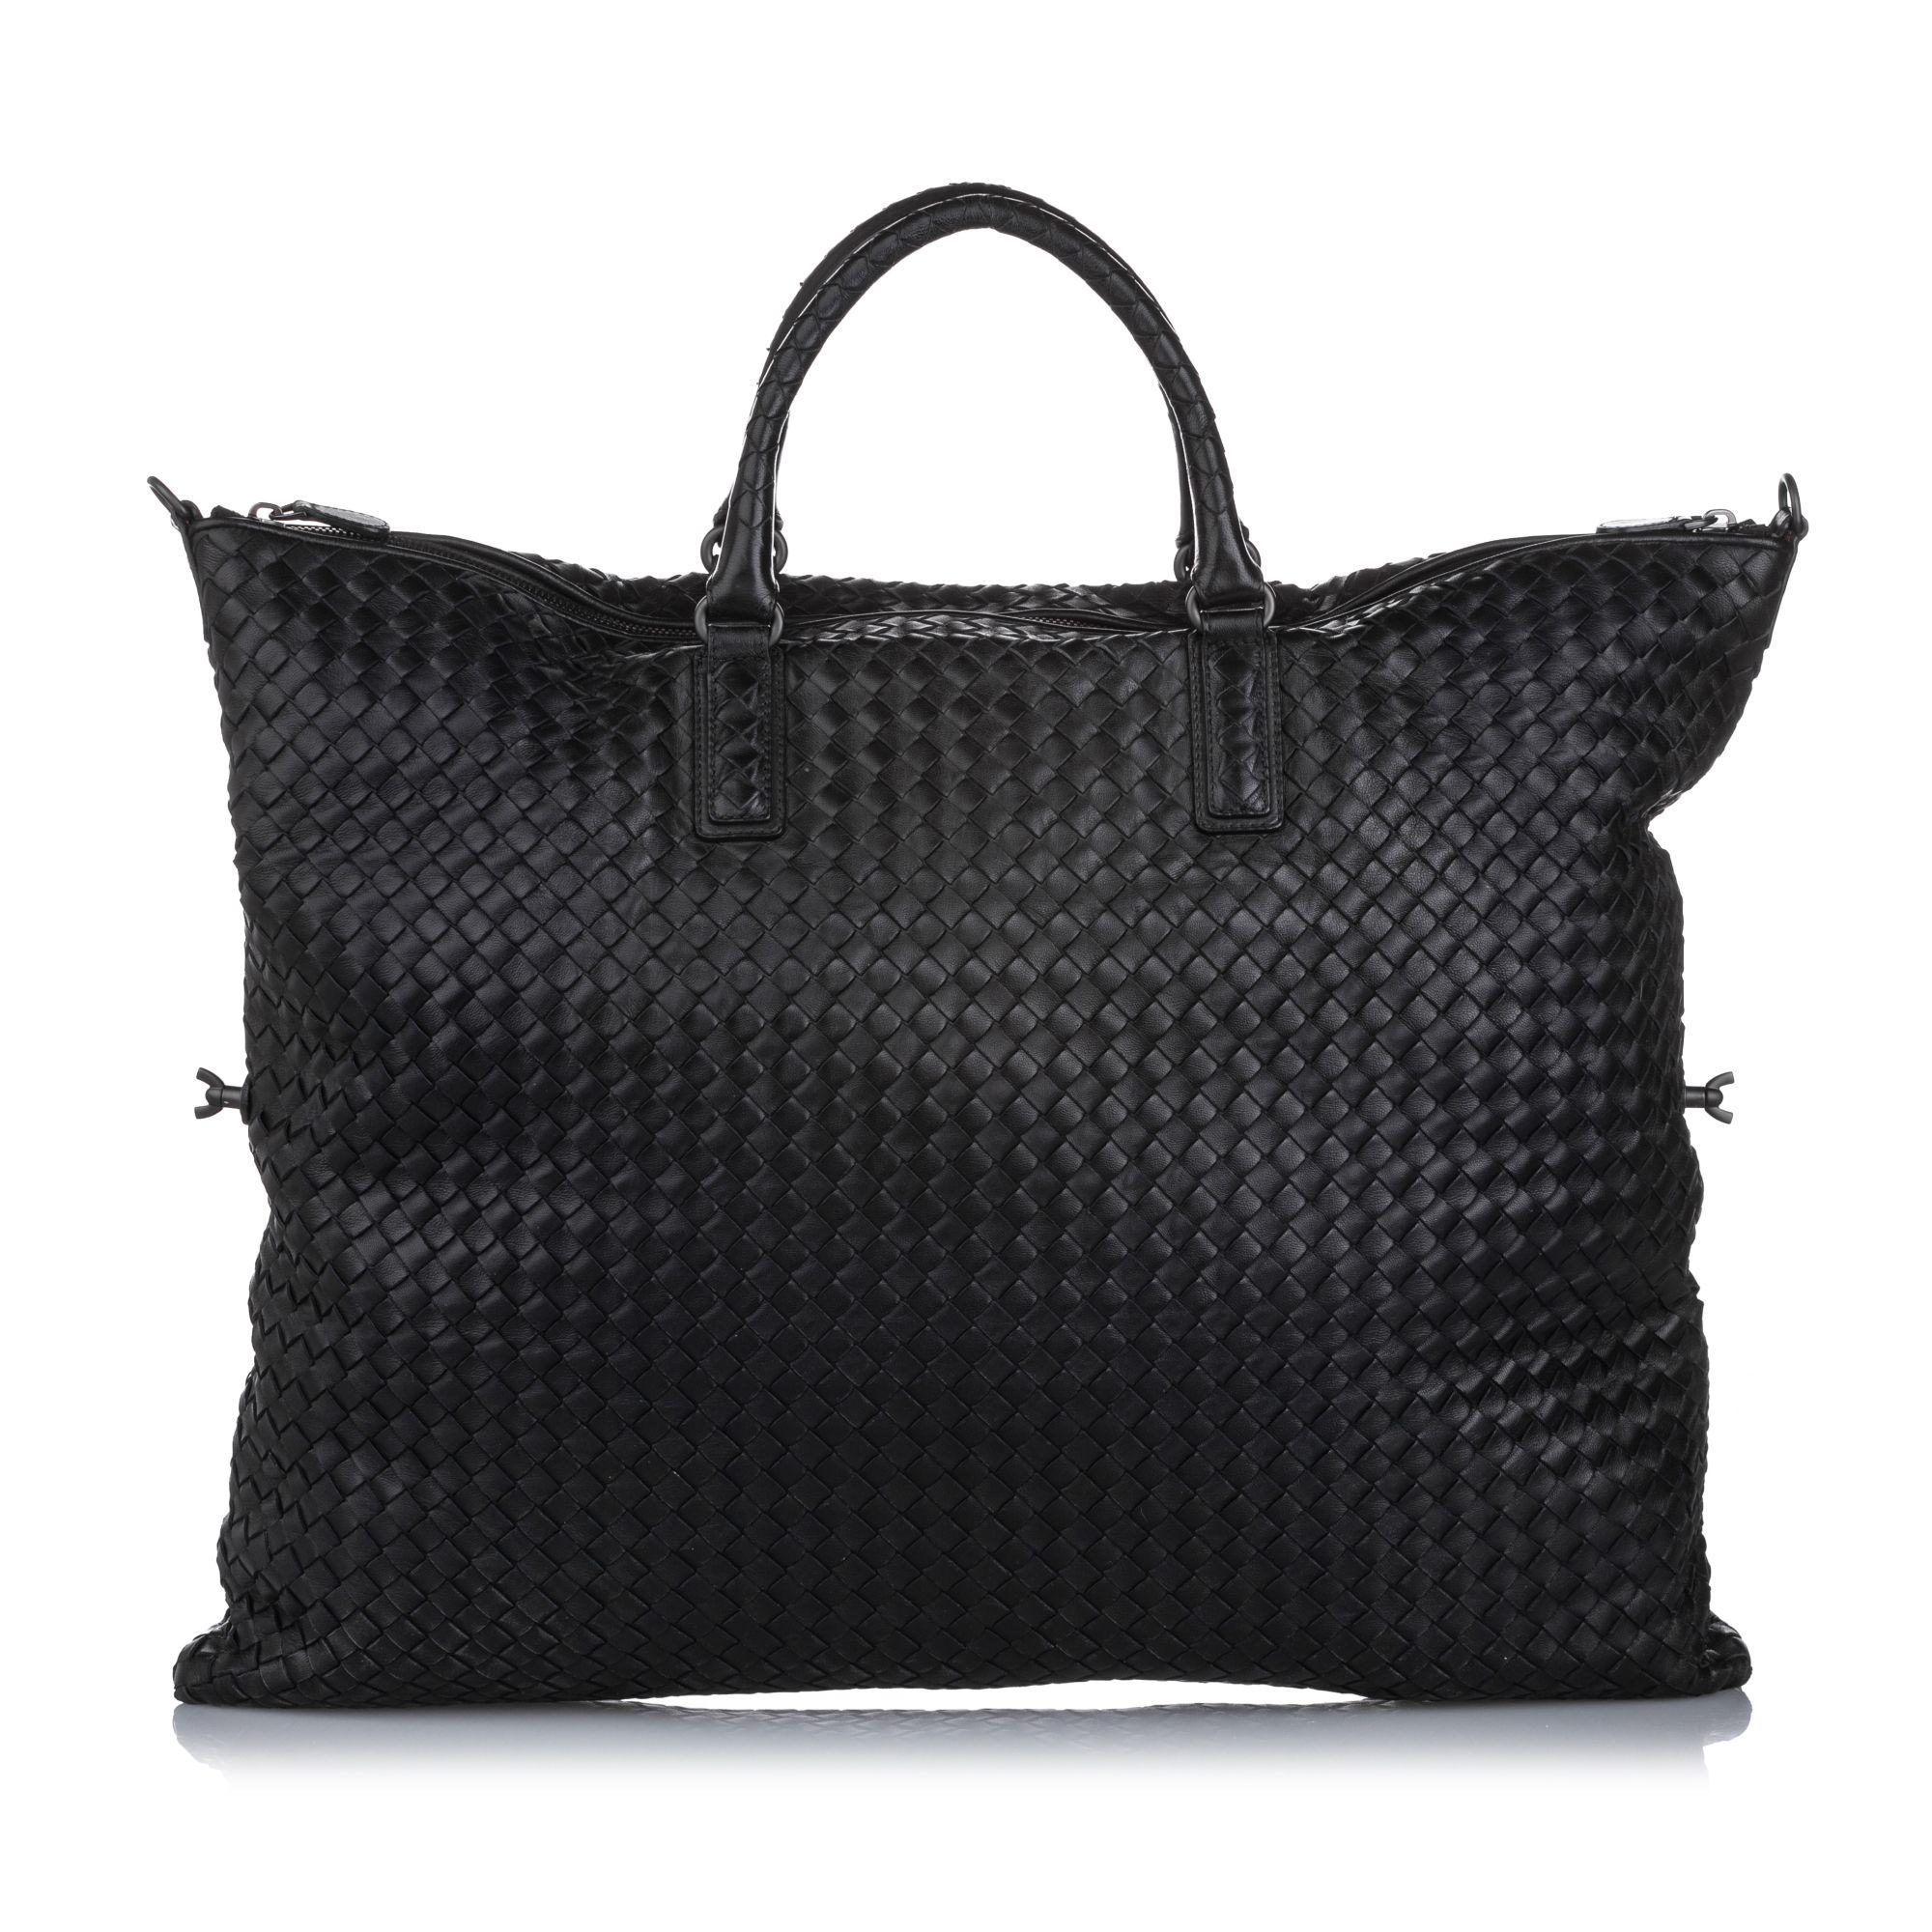 Vintage Bottega Veneta Maxi Intrecciato Convertible Travel Bag Black